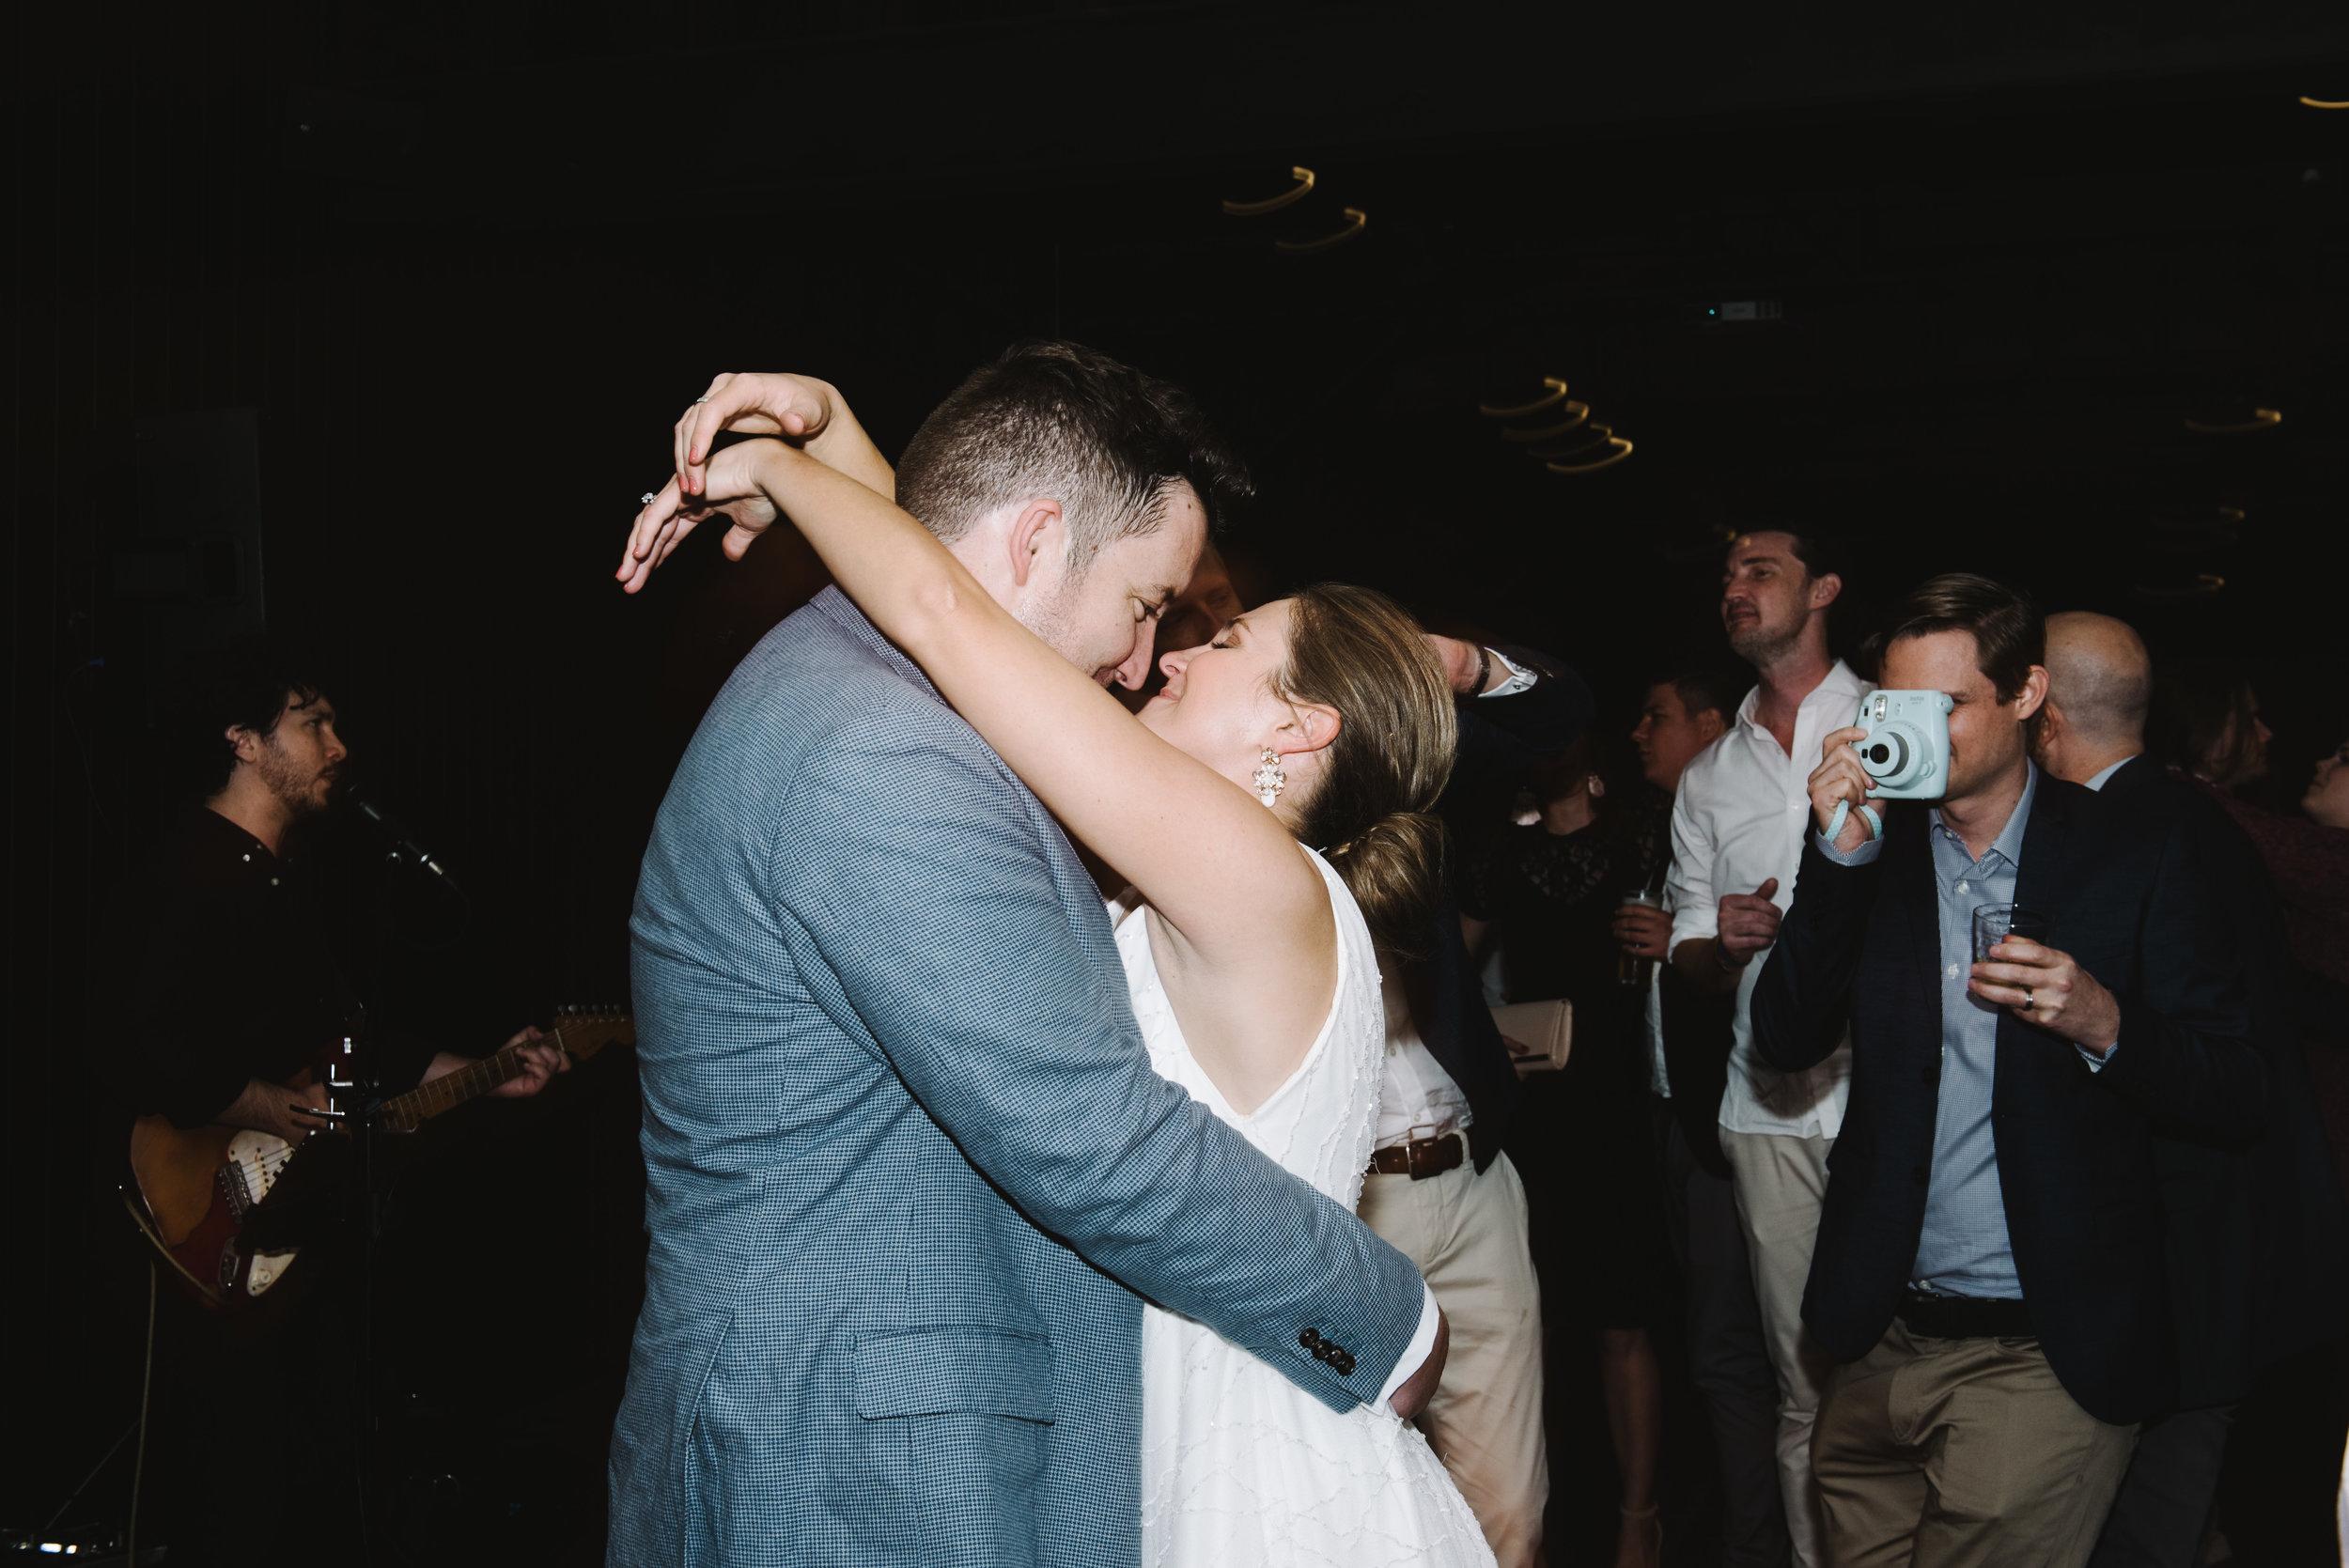 refinery-brisbane-wedding-reception-13.jpg